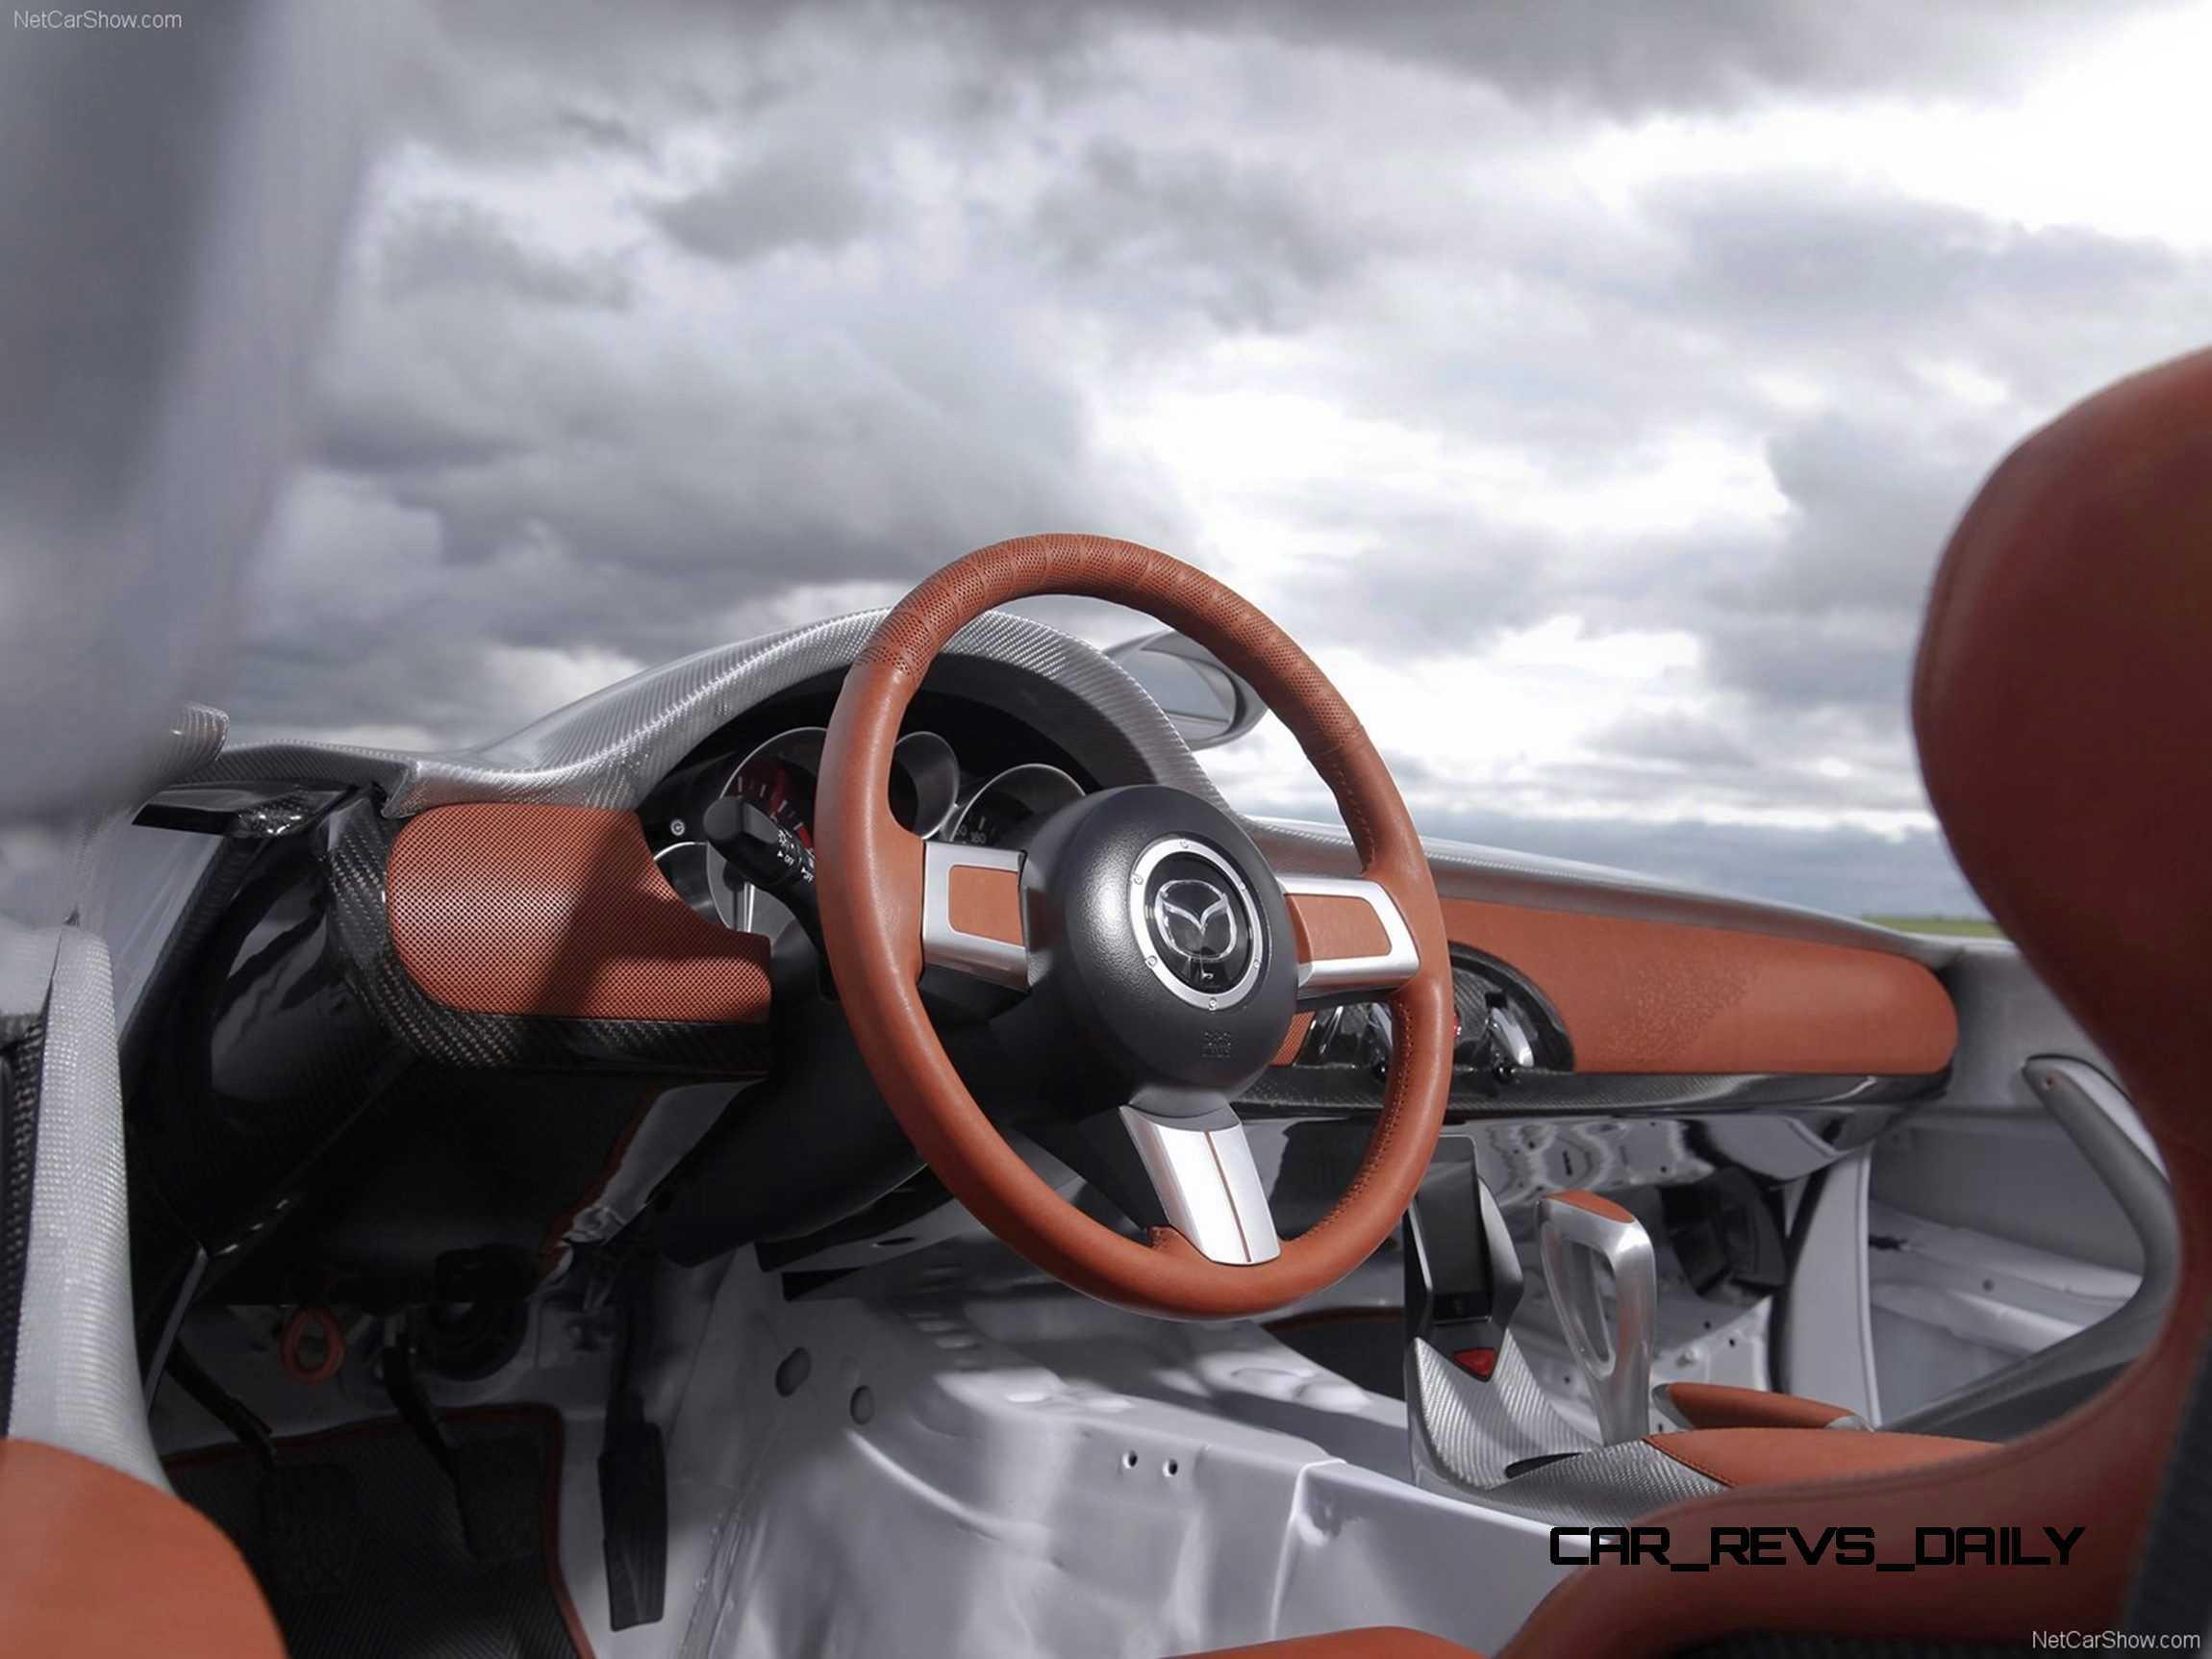 http://www.car-revs-daily.com/wp-content/uploads/2015/05/Mazda-MX-5_Superlight_Concept_2009_1600x1200_wallpaper_1f.jpg